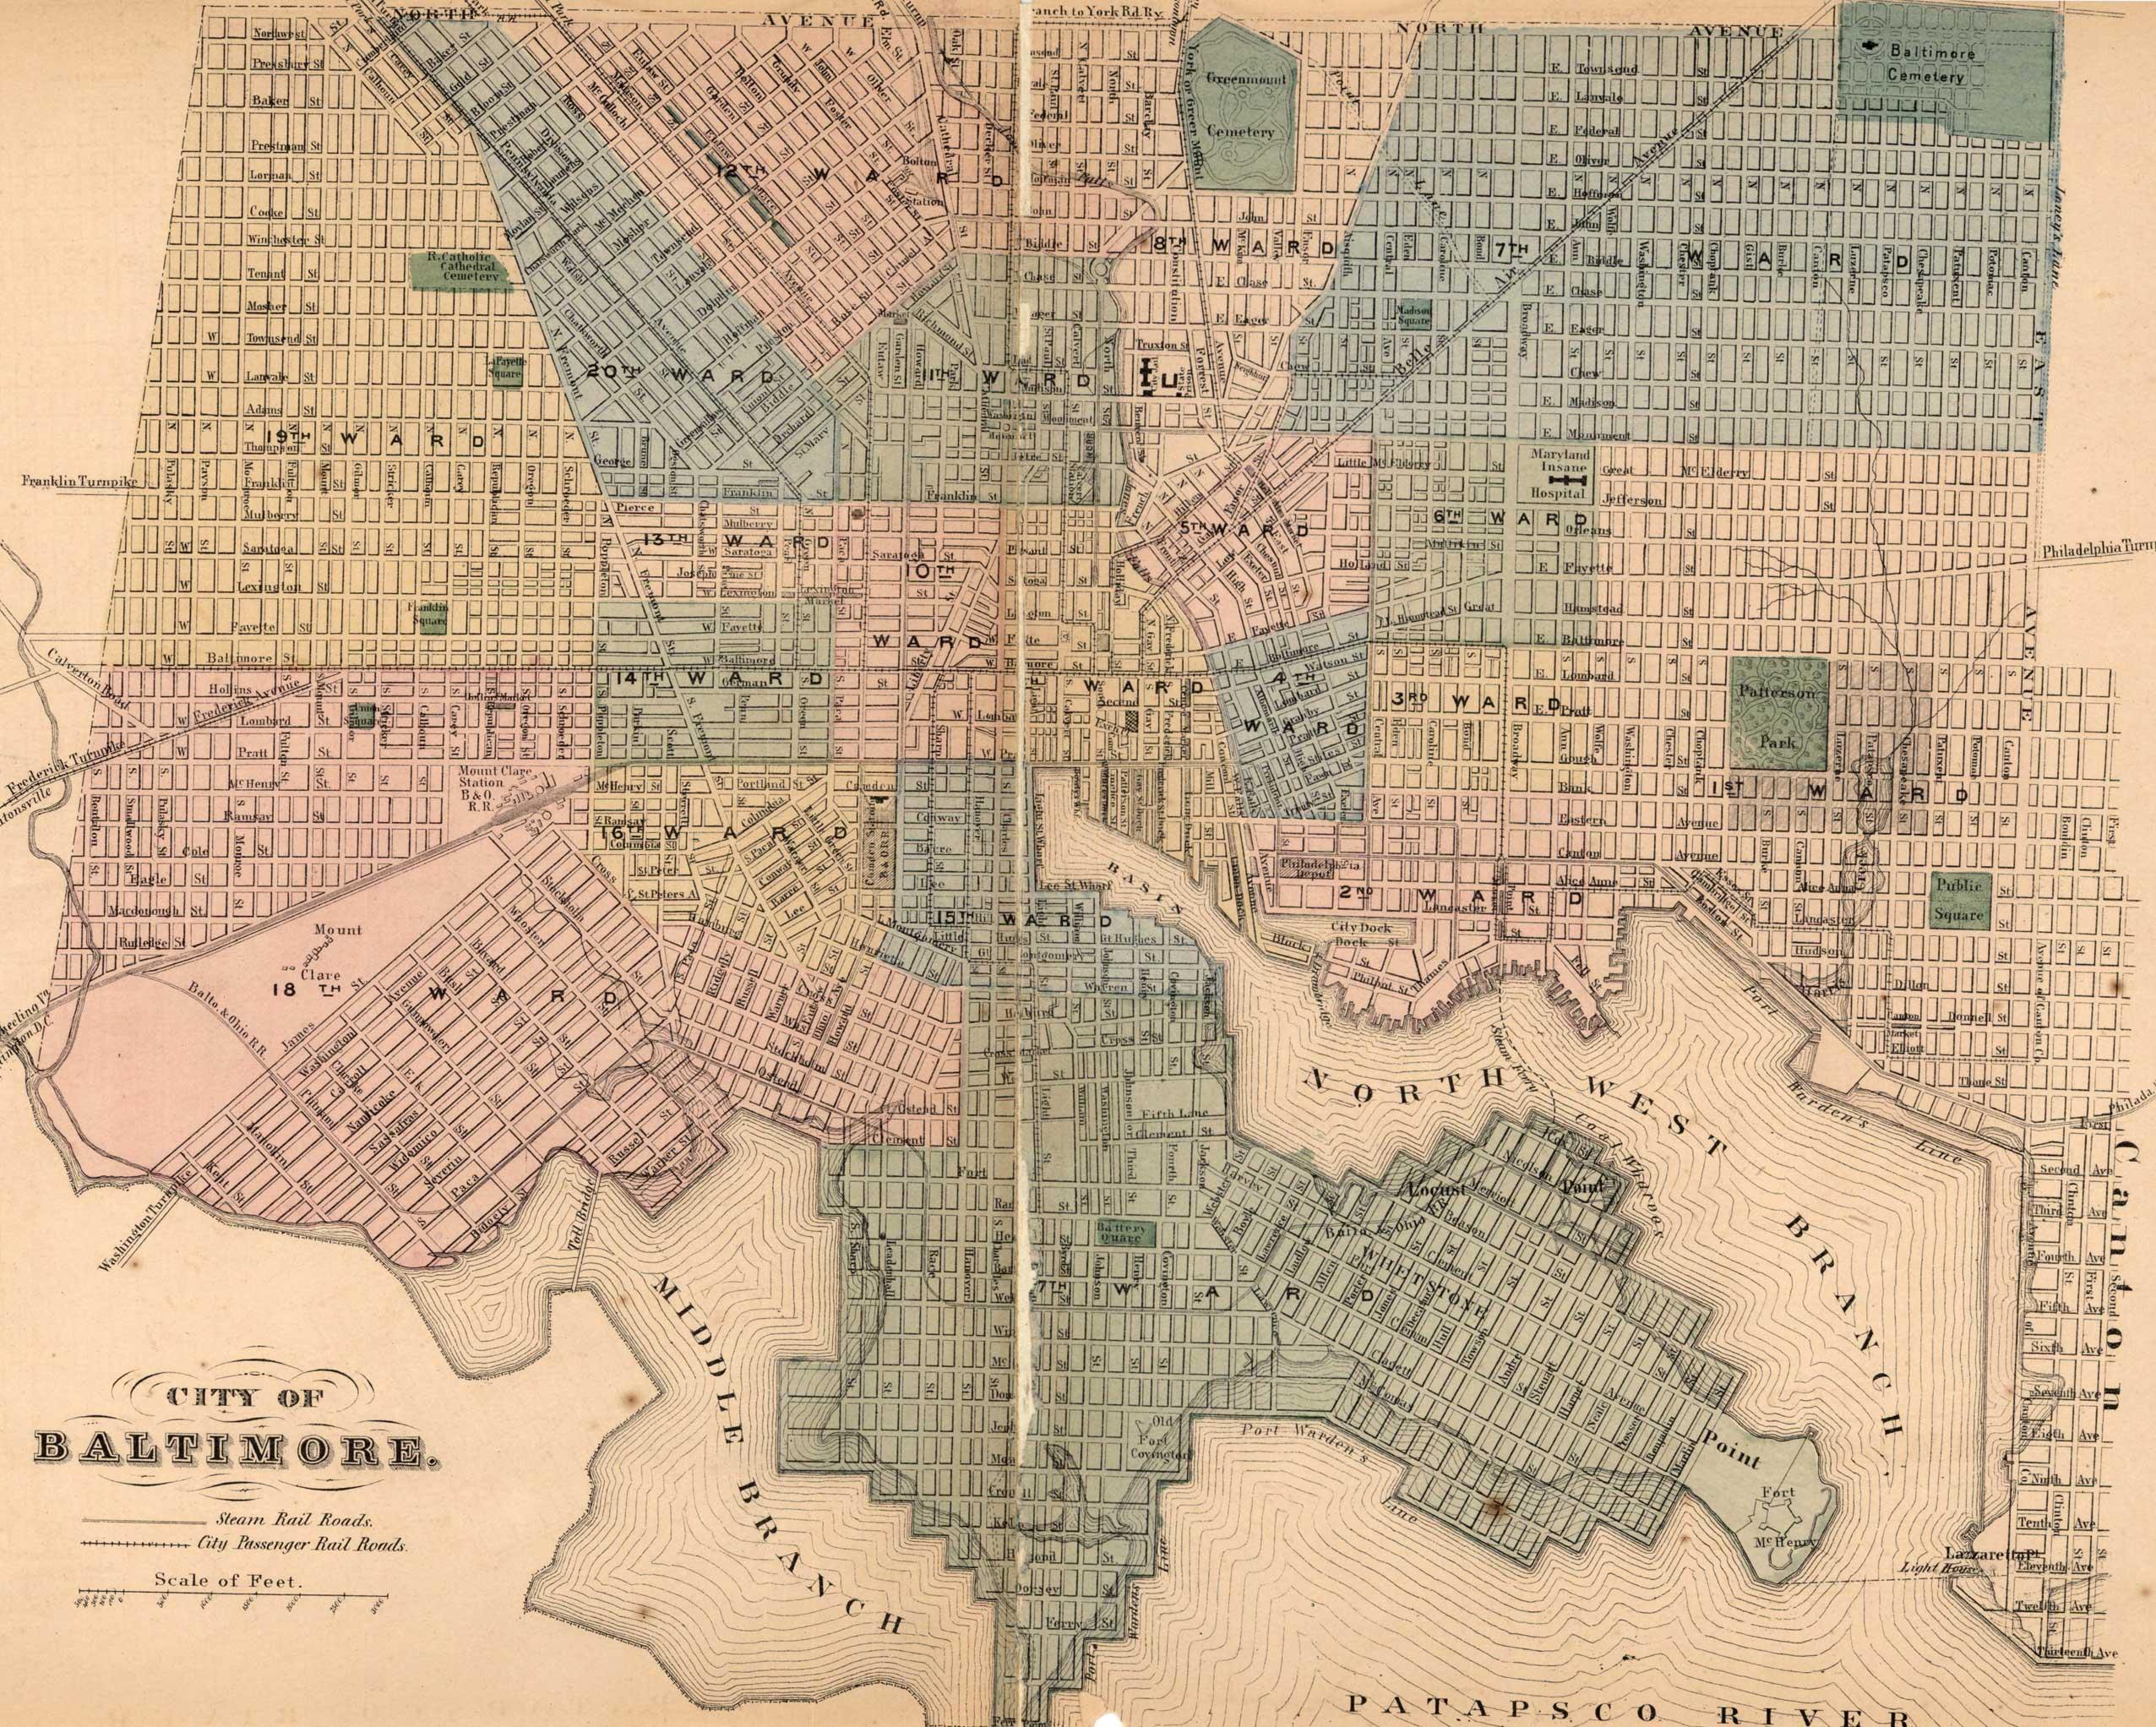 baltimore city  simon j  martenet  martenet u0026 39 s atlas of